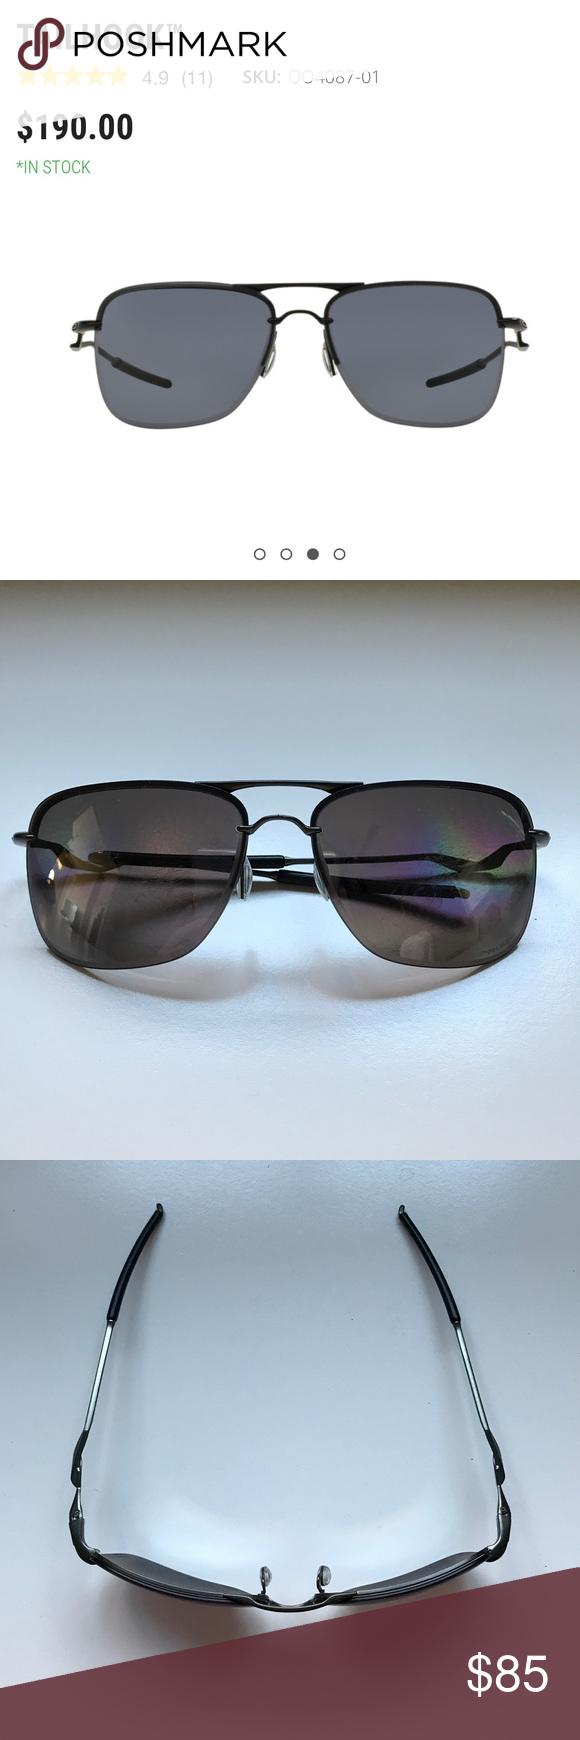 42b91e58a16 Oakley TailHook Polarized Sunglasses